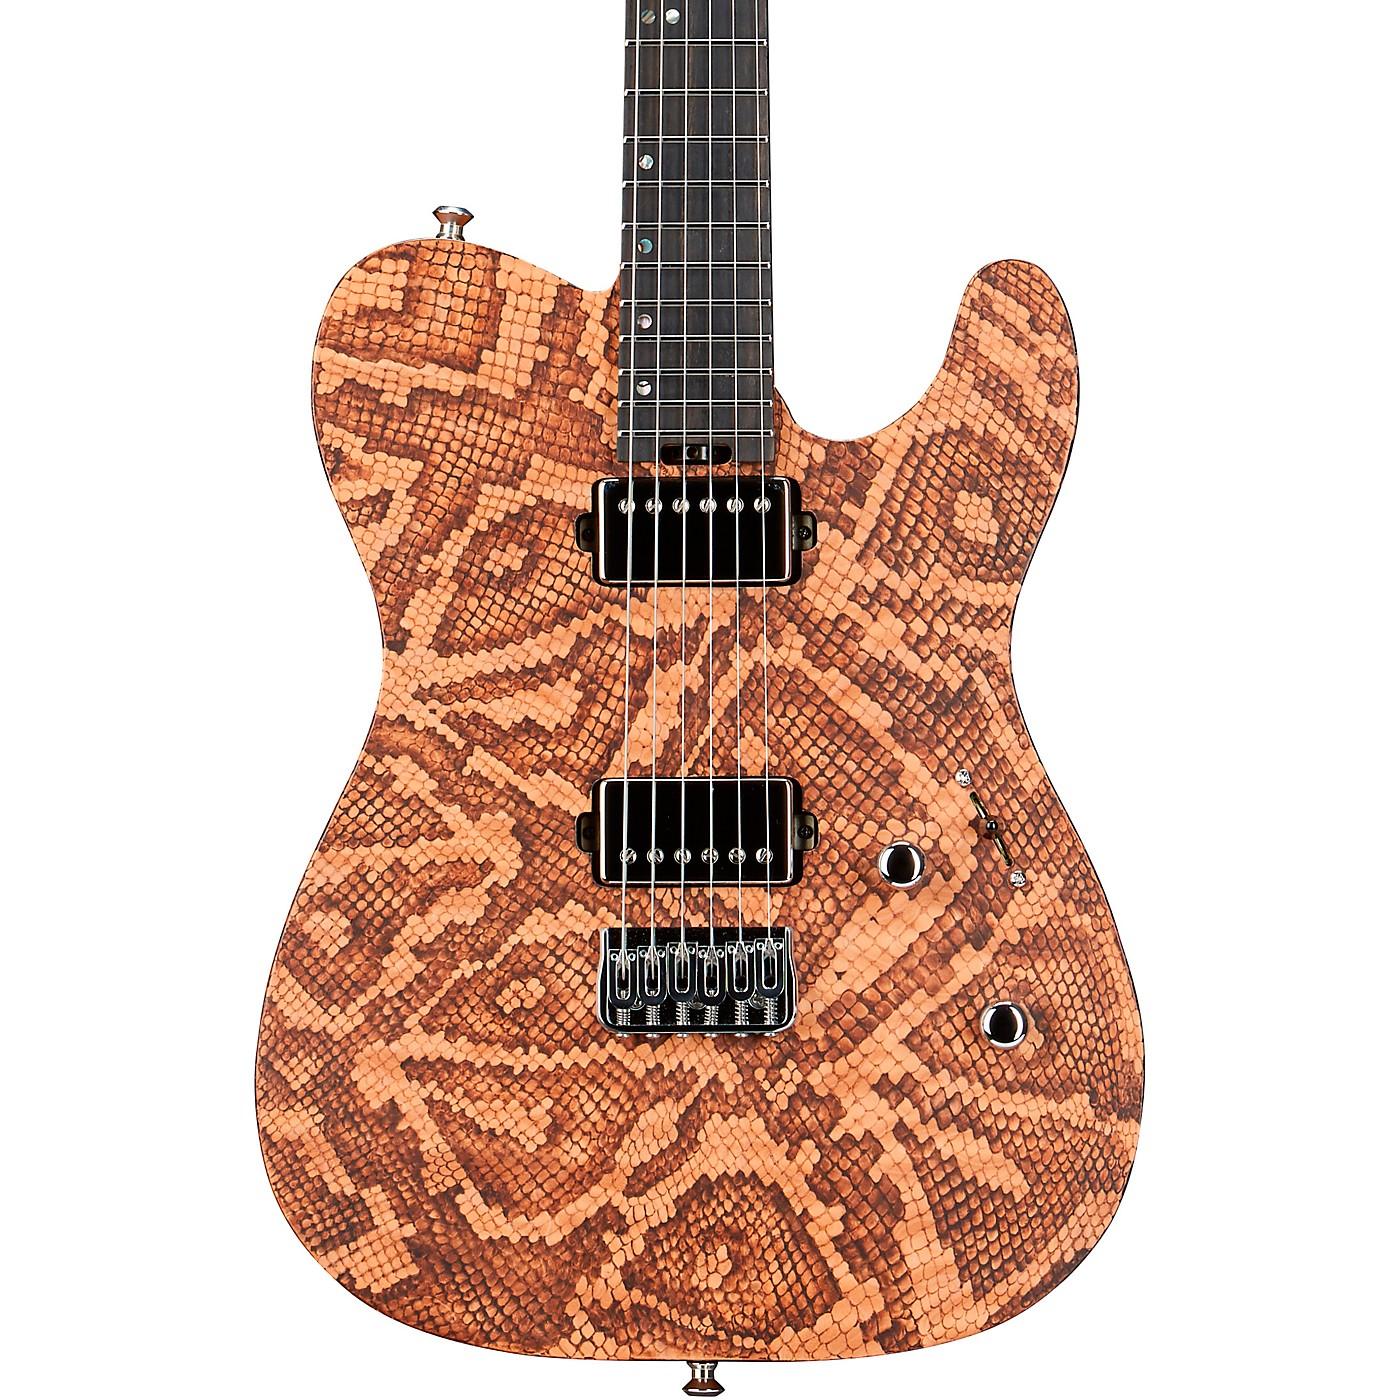 ESP ESP USA TE-II Hardtail Snake Skin Electric Guitar thumbnail